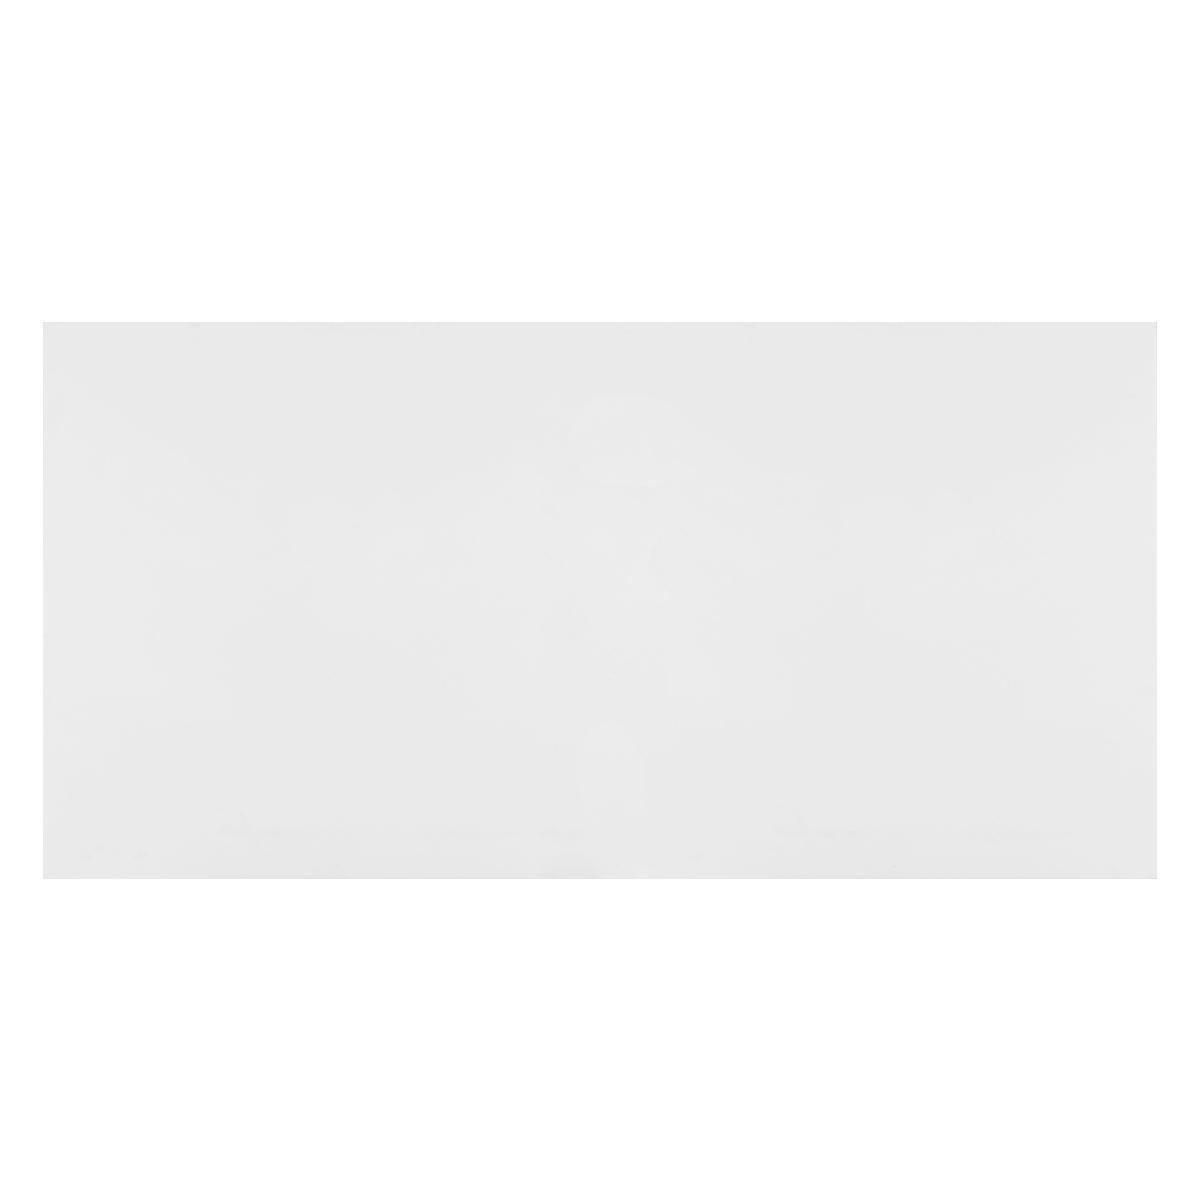 Porcelanato Artico Blanco Pulido brillante - 59X118.2 cm - 1.39 m2